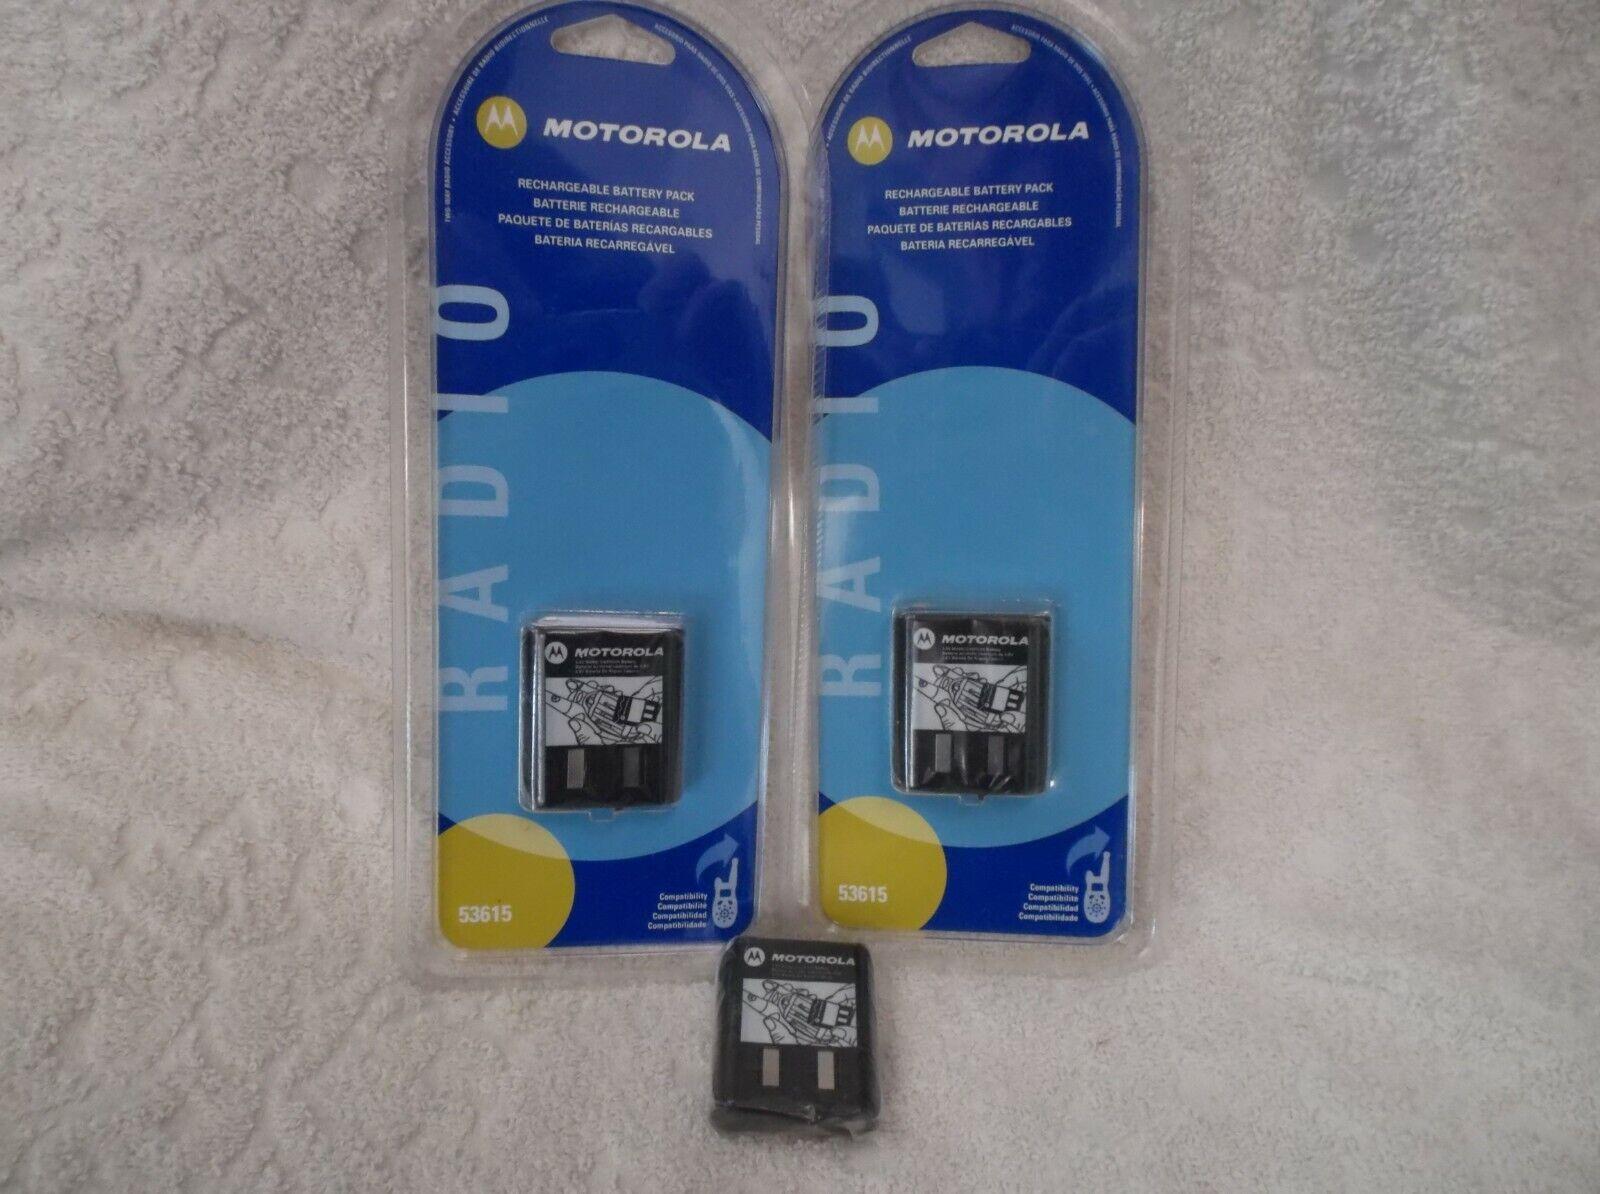 OEM Motorola 53615 TALKABOUT Rechargeable Battery 650mAh 2-Way Radios KEBT-071-D